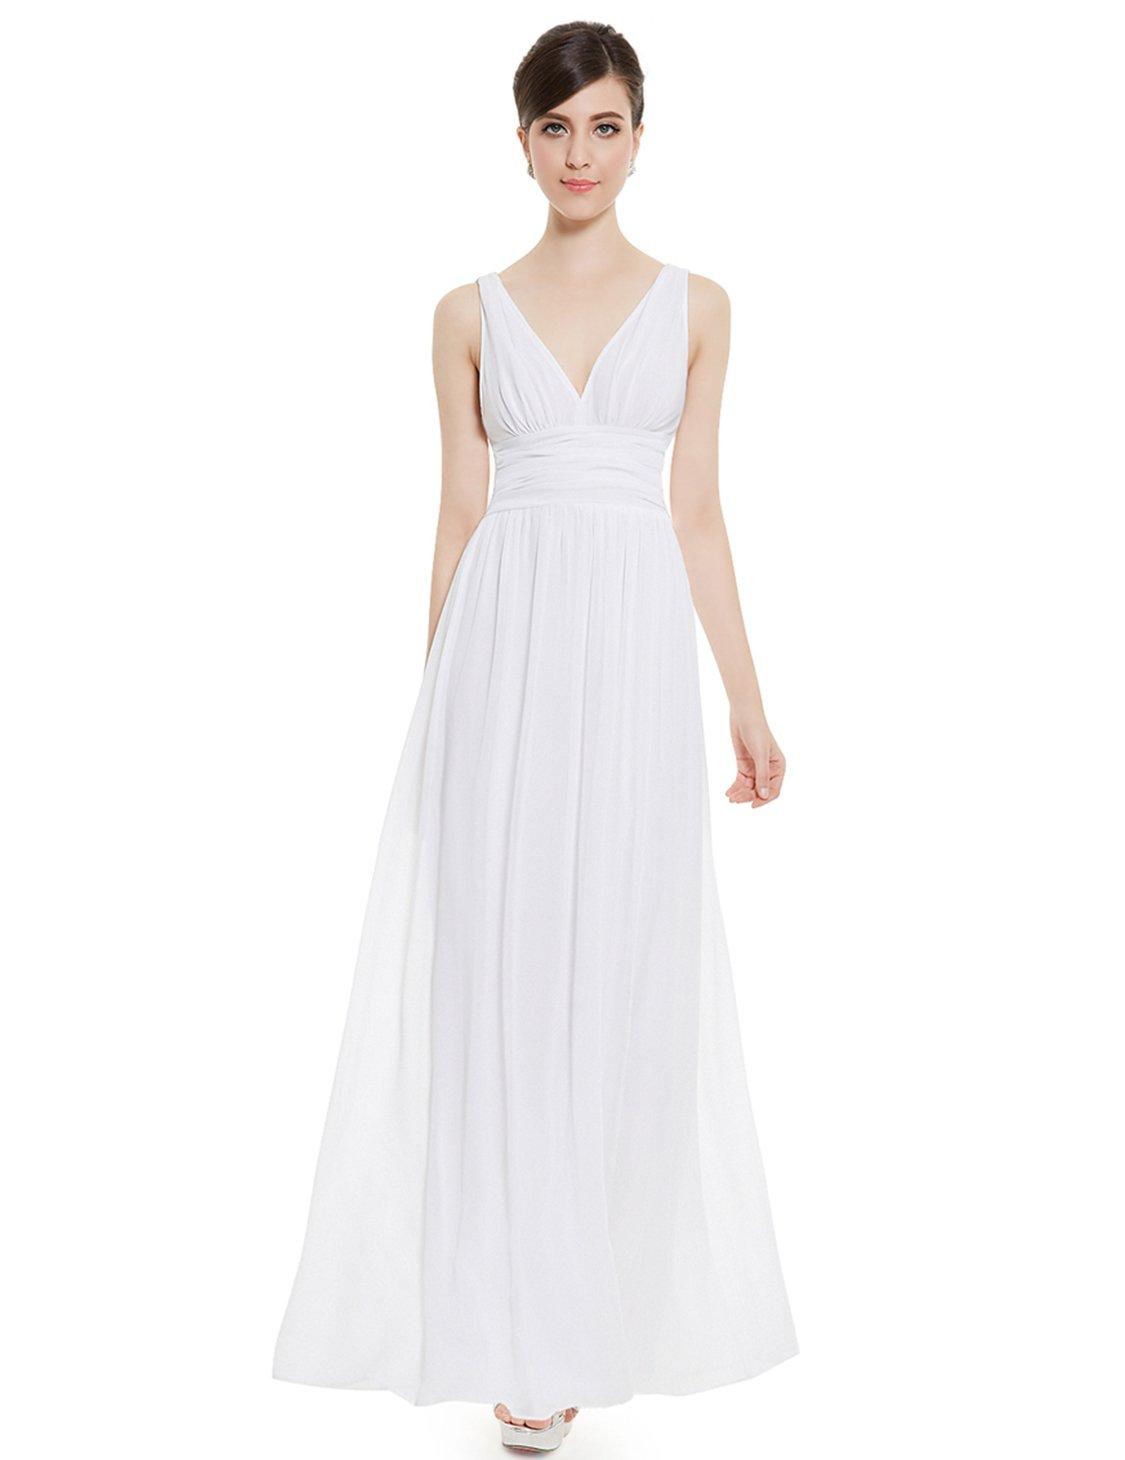 Ever-Pretty Sexy Chiffon White Dresses for Women 8US White by Ever-Pretty